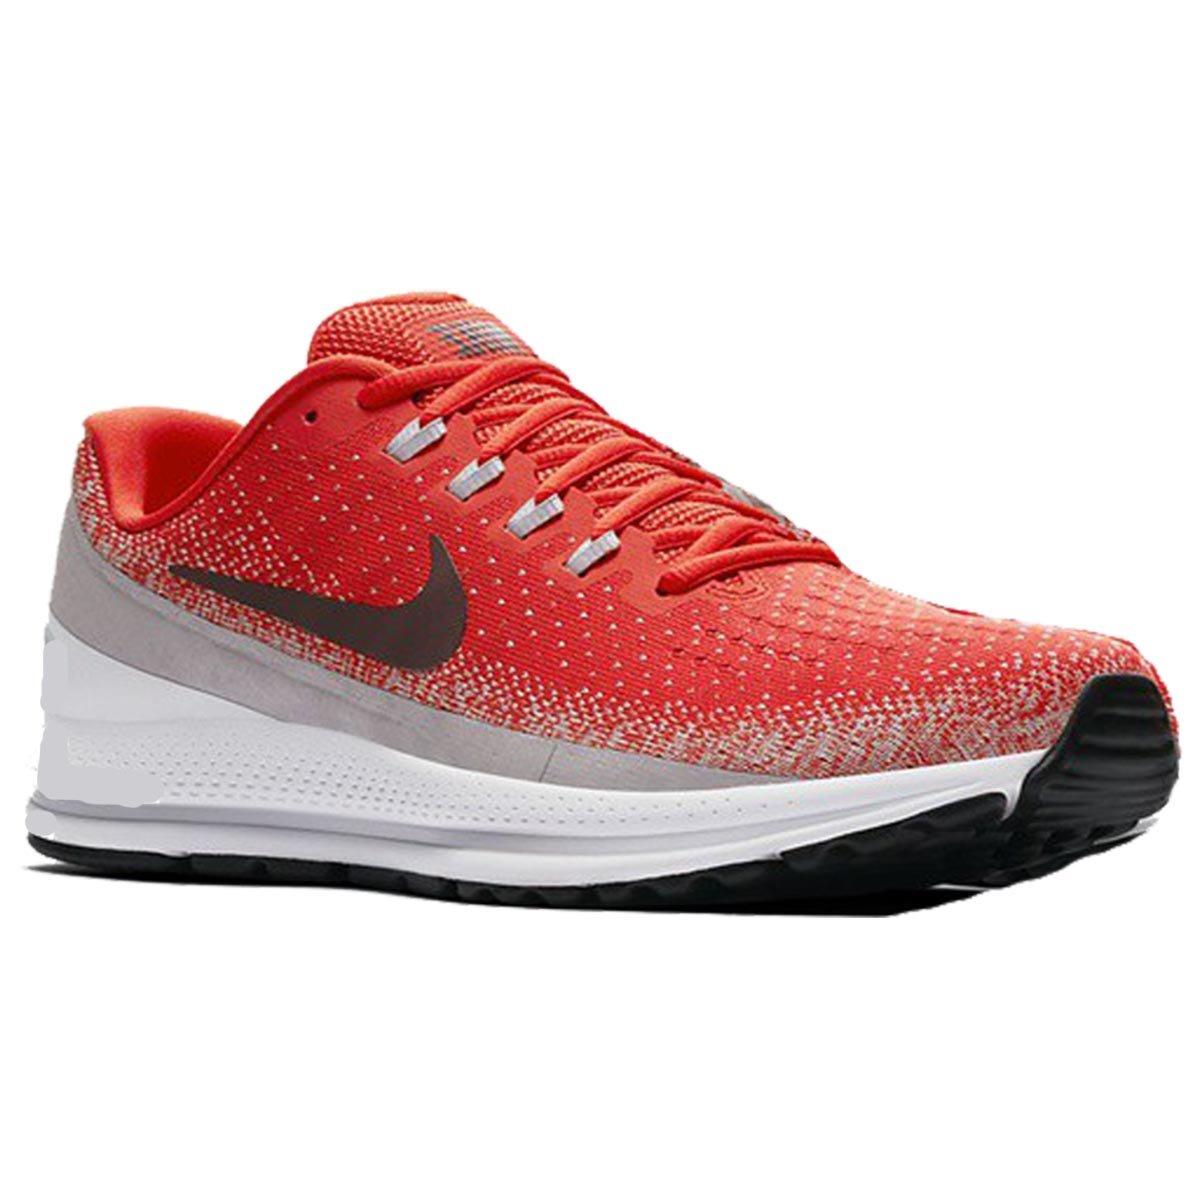 Nike Air Zoom Vomero 13 Running Shoes (RedBurgundy)